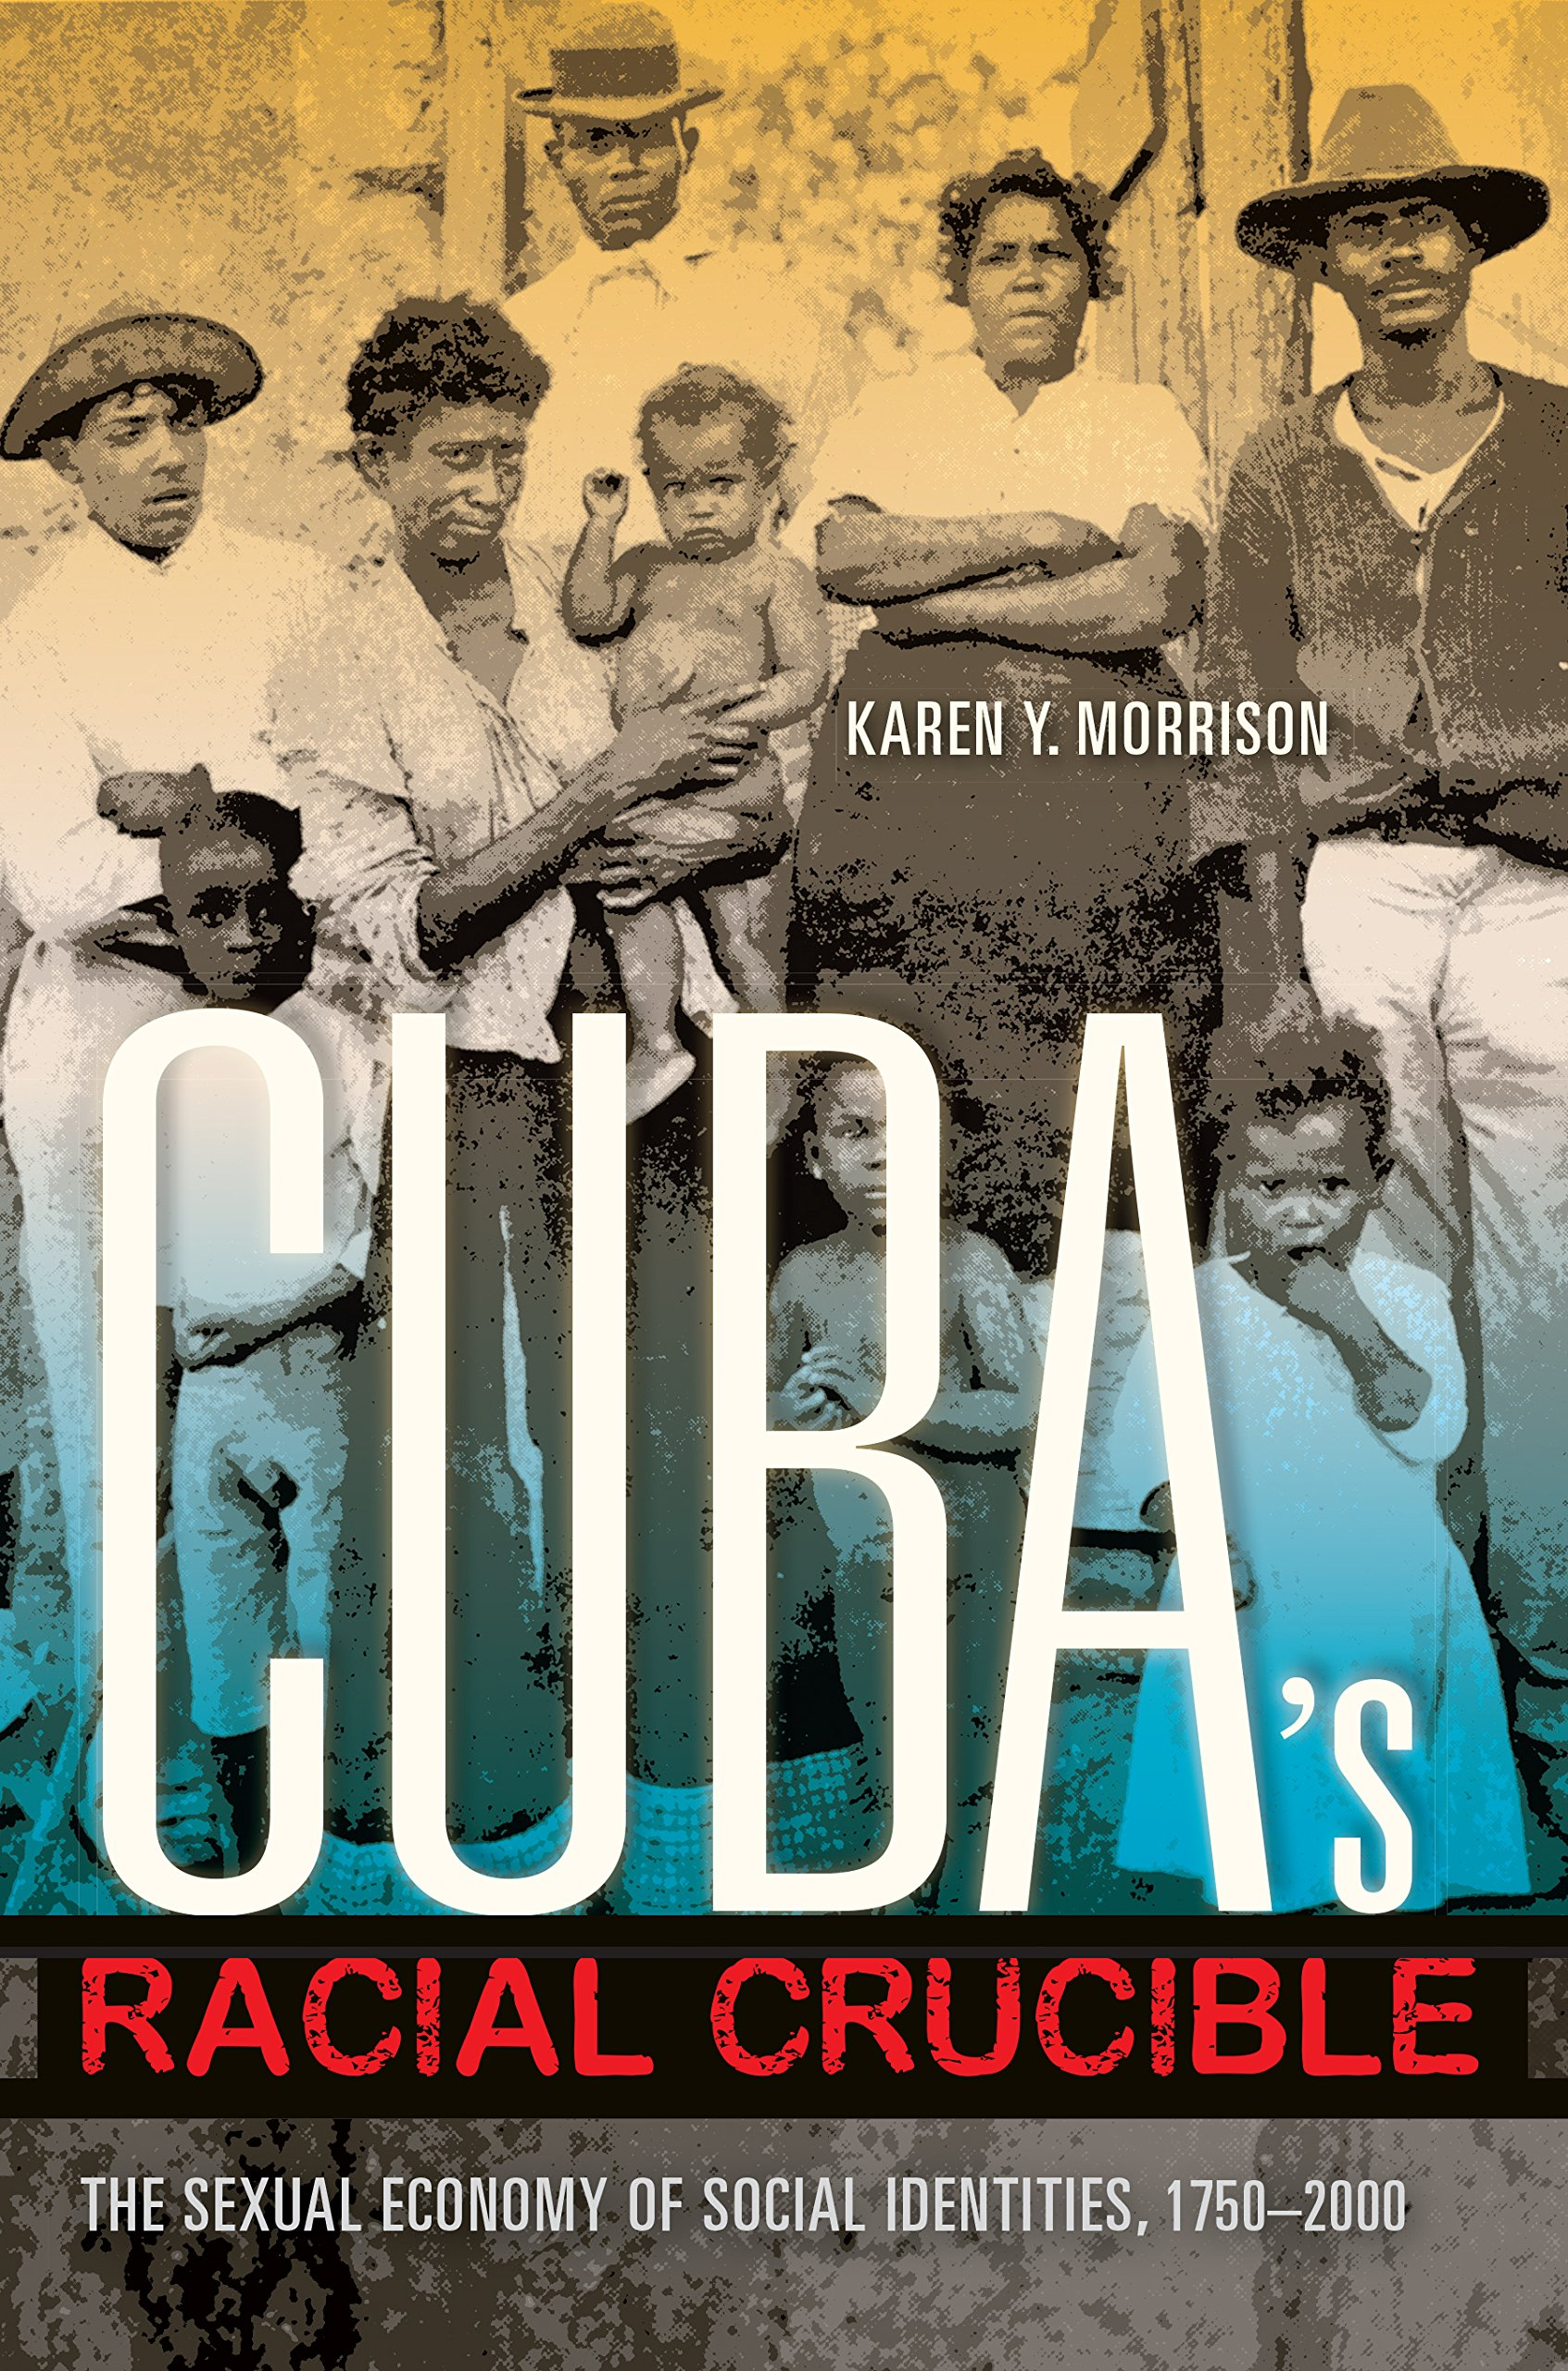 Download Cuba's Racial Crucible: The Sexual Economy of Social Identities, 1750-2000 (Blacks in the Diaspora) PDF Text fb2 book